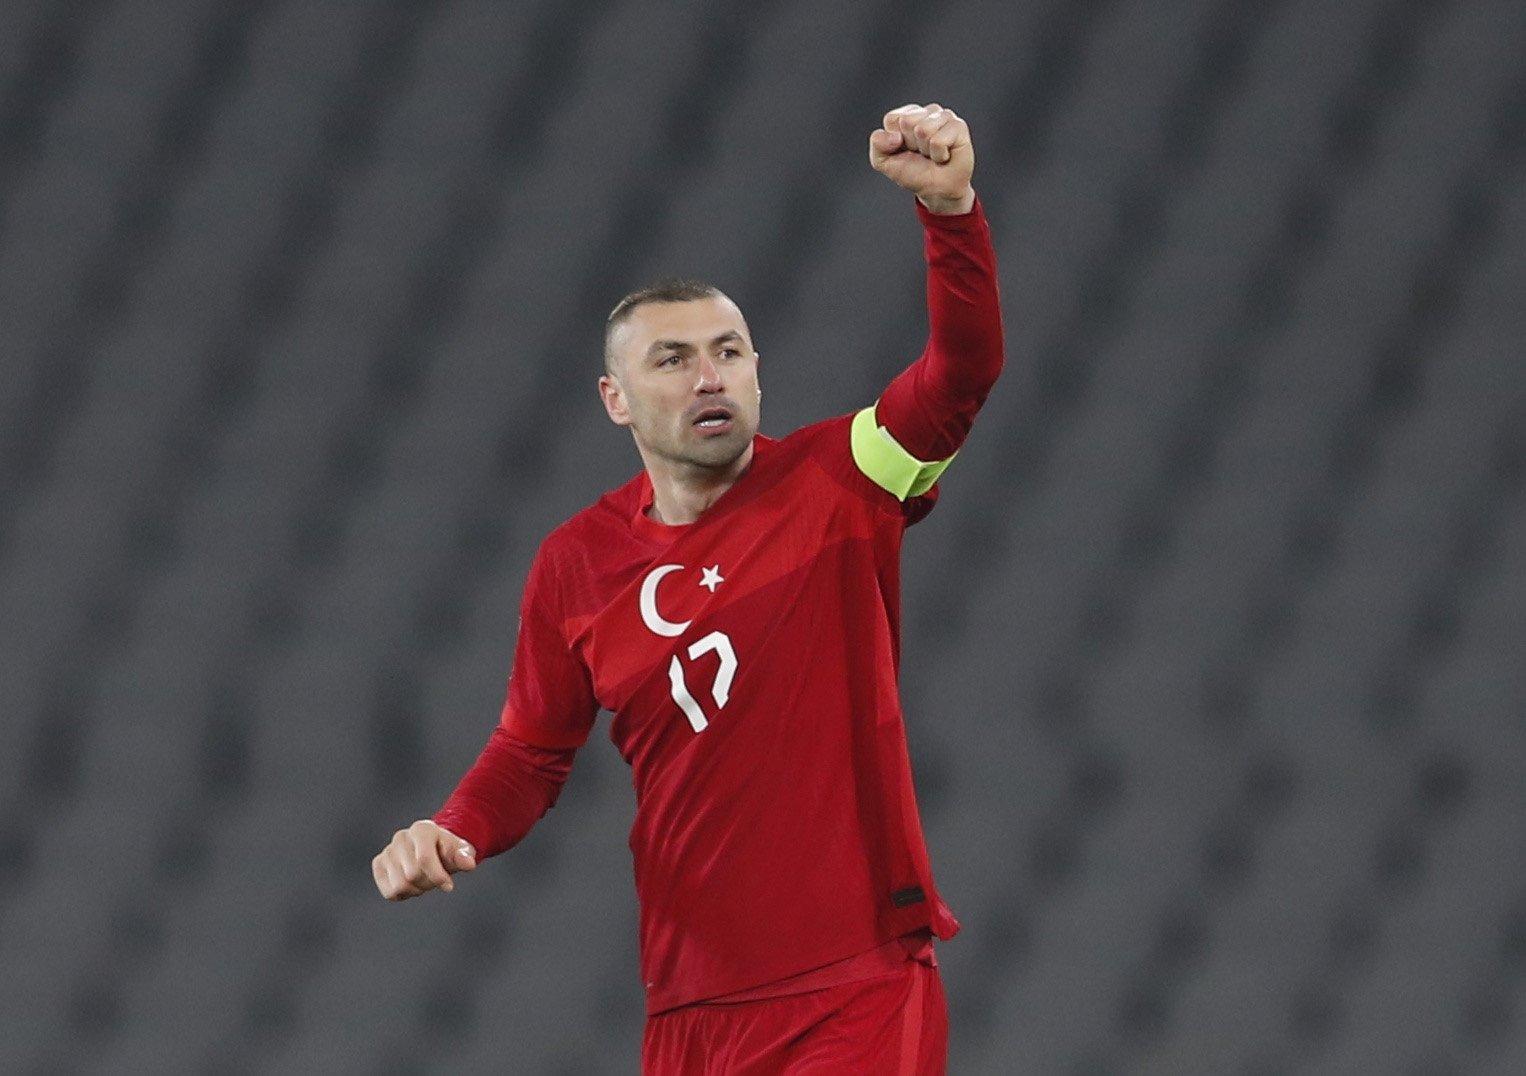 Turkey striker Burak Yılmaz celebrates scoring a goal in World Cup qualification Group G football match between Turkey and Latvia at the Atatürk Olympic Stadium in Istanbul, March 30, 2021. (Reuters Photo)